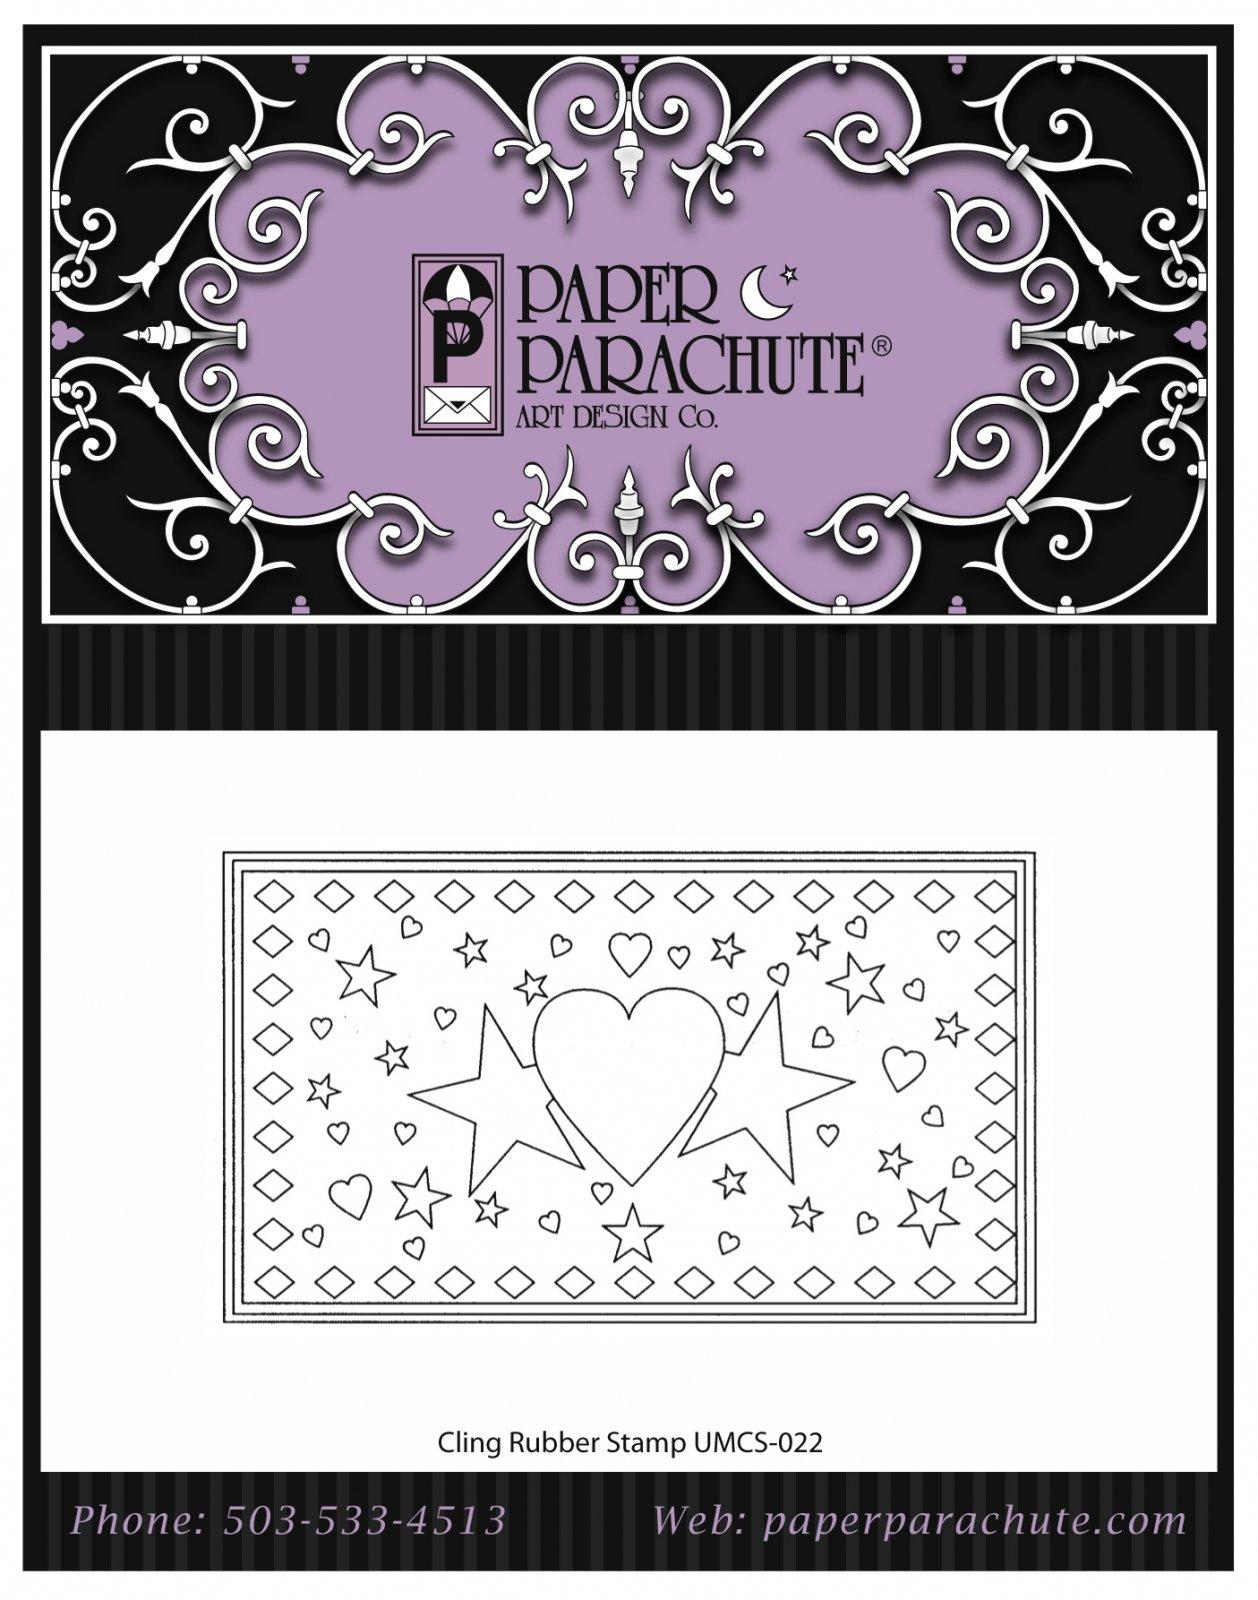 Paper Parachute Rubber Stamp - UMCS22